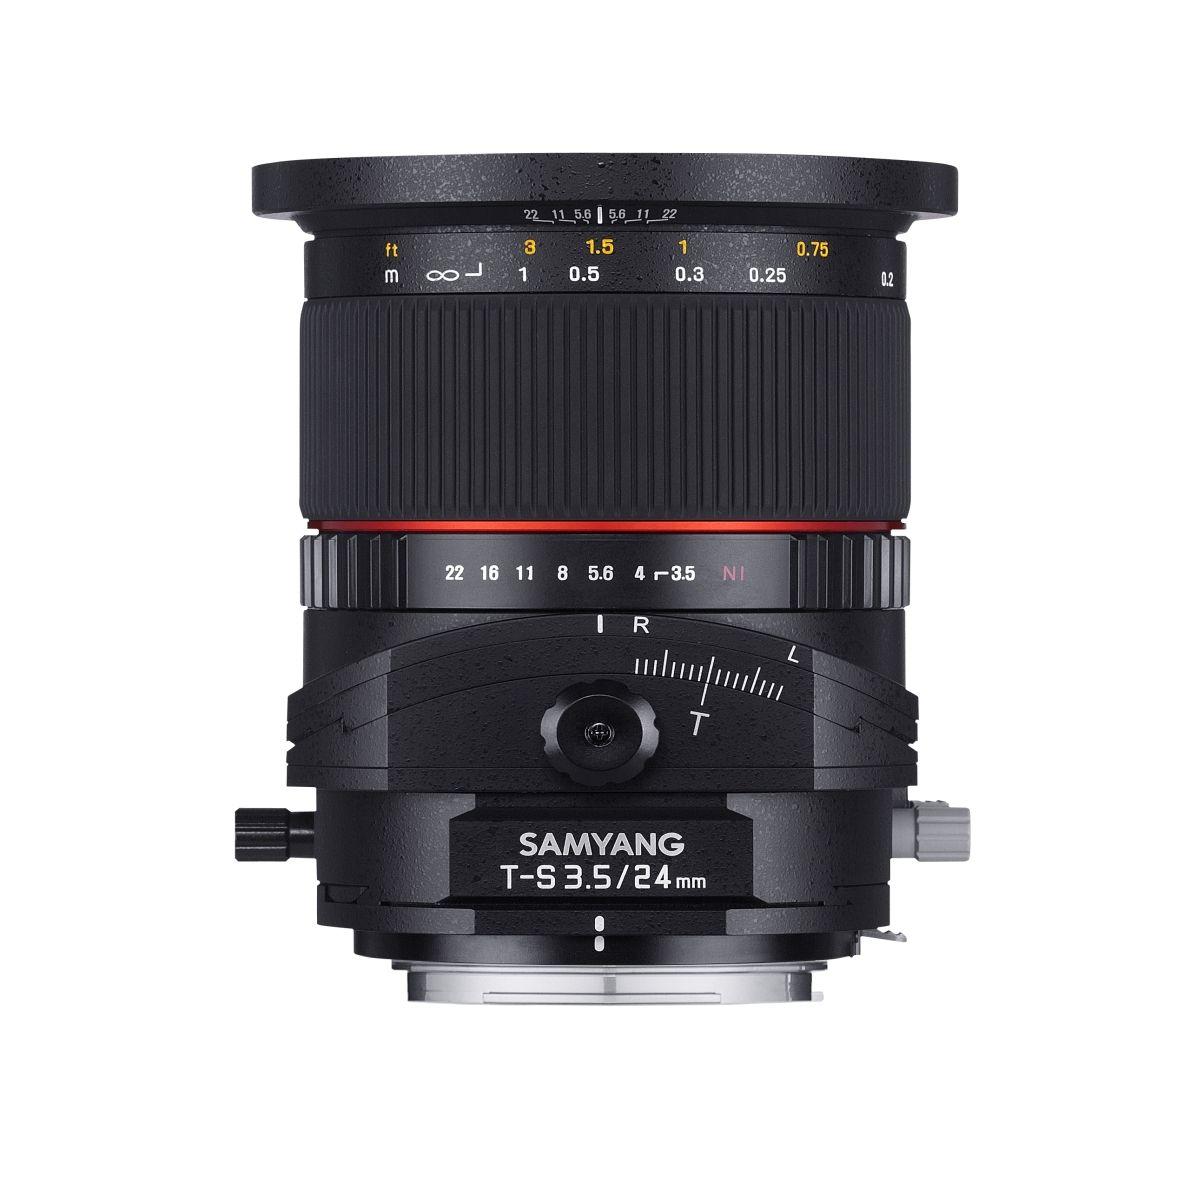 Samyang 24/3,5 DSLR T/S Nikon F | Foto Walser